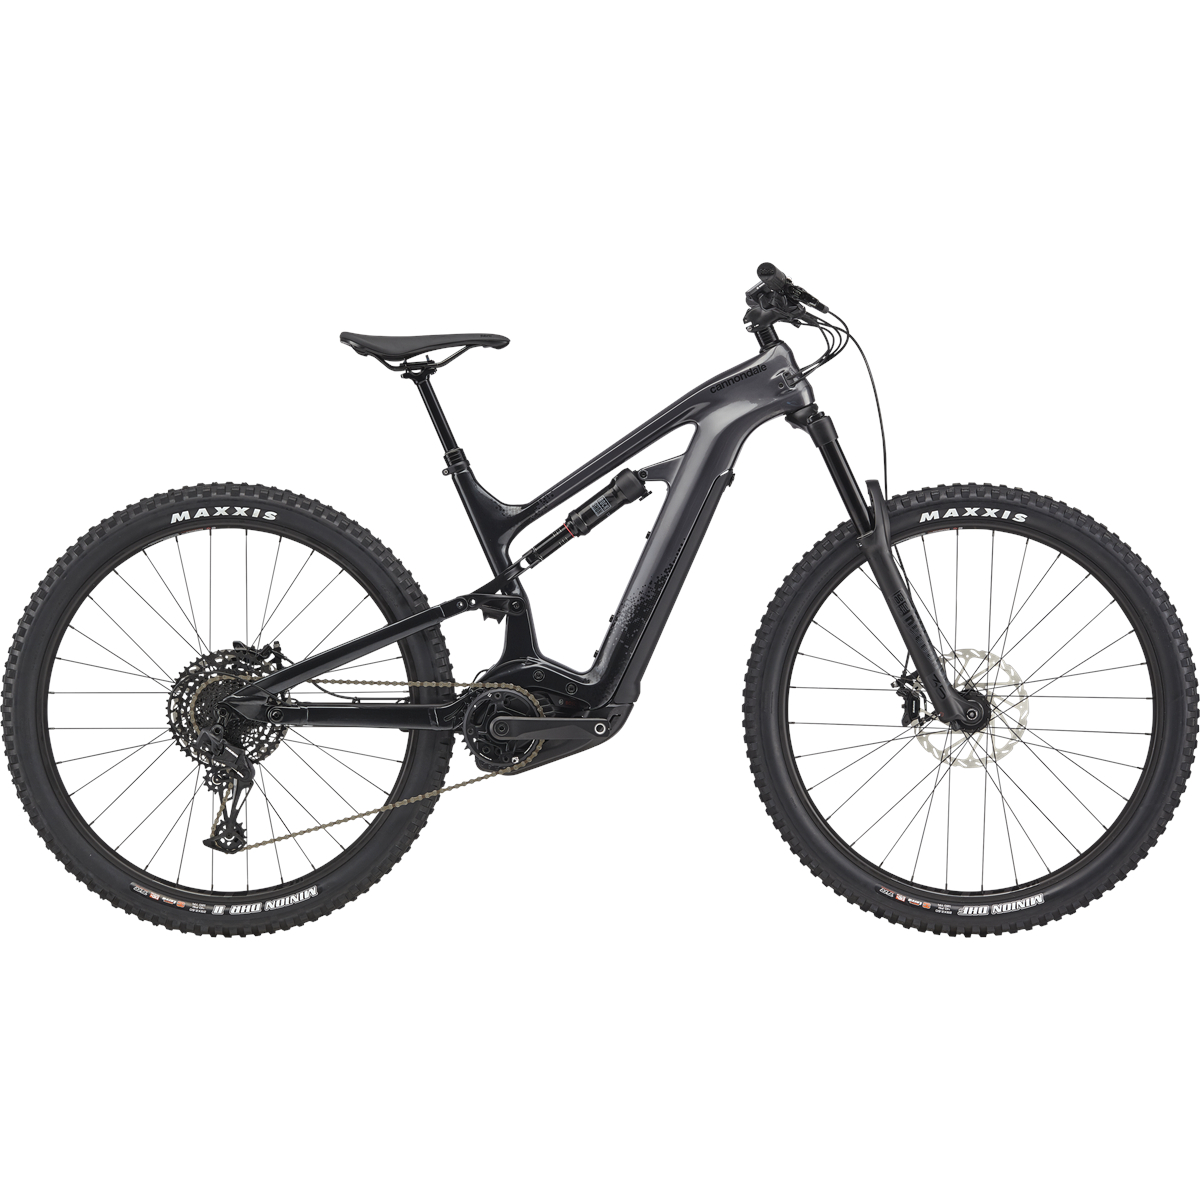 "Cannondale MOTERRA NEO Carbon 3+ - 27.5/29"" MTB E-Bike - 2021 - Matte Black"